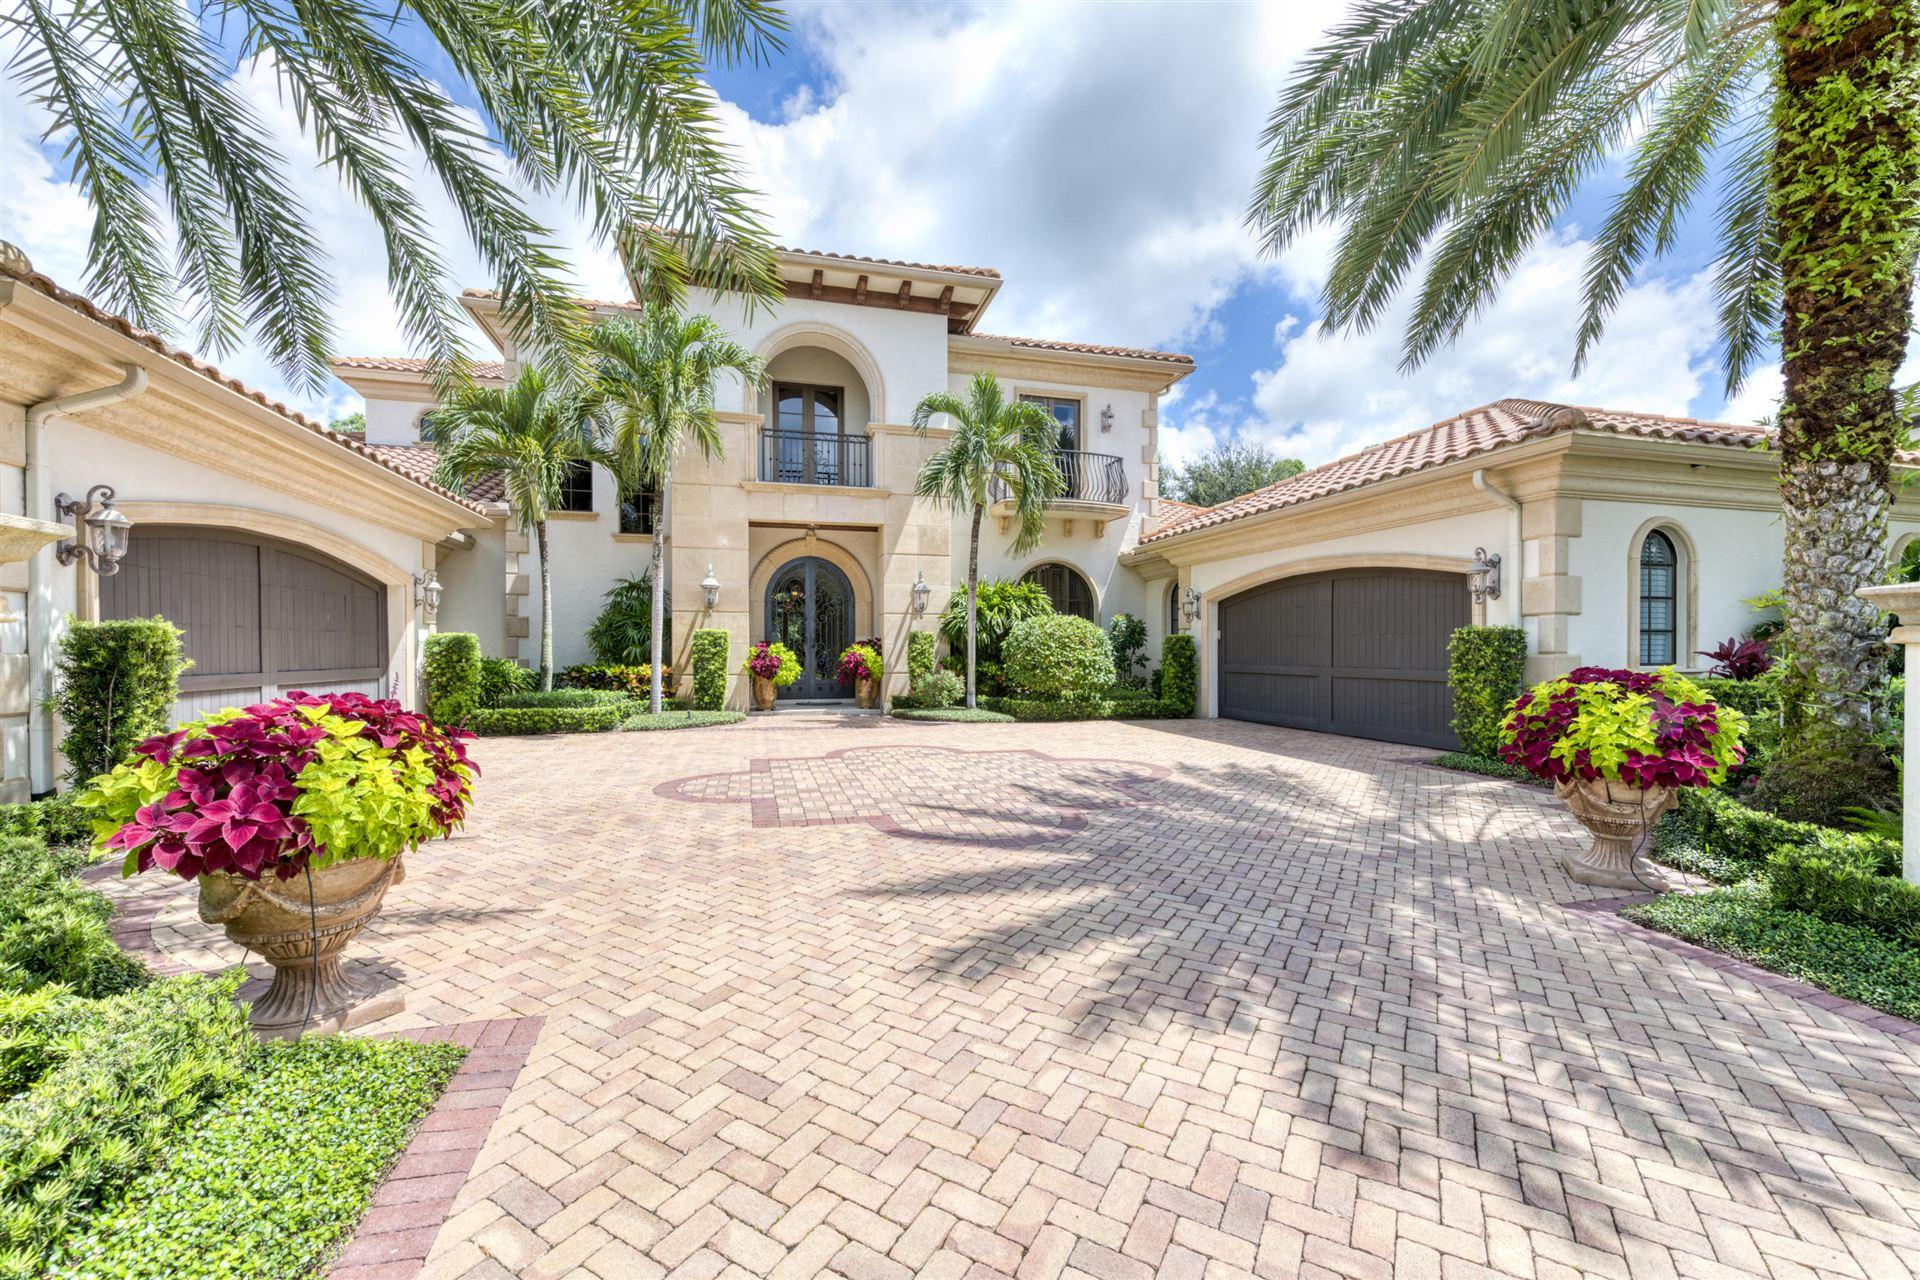 Photo of 107 Via Palacio, Palm Beach Gardens, FL 33418 (MLS # RX-10646654)